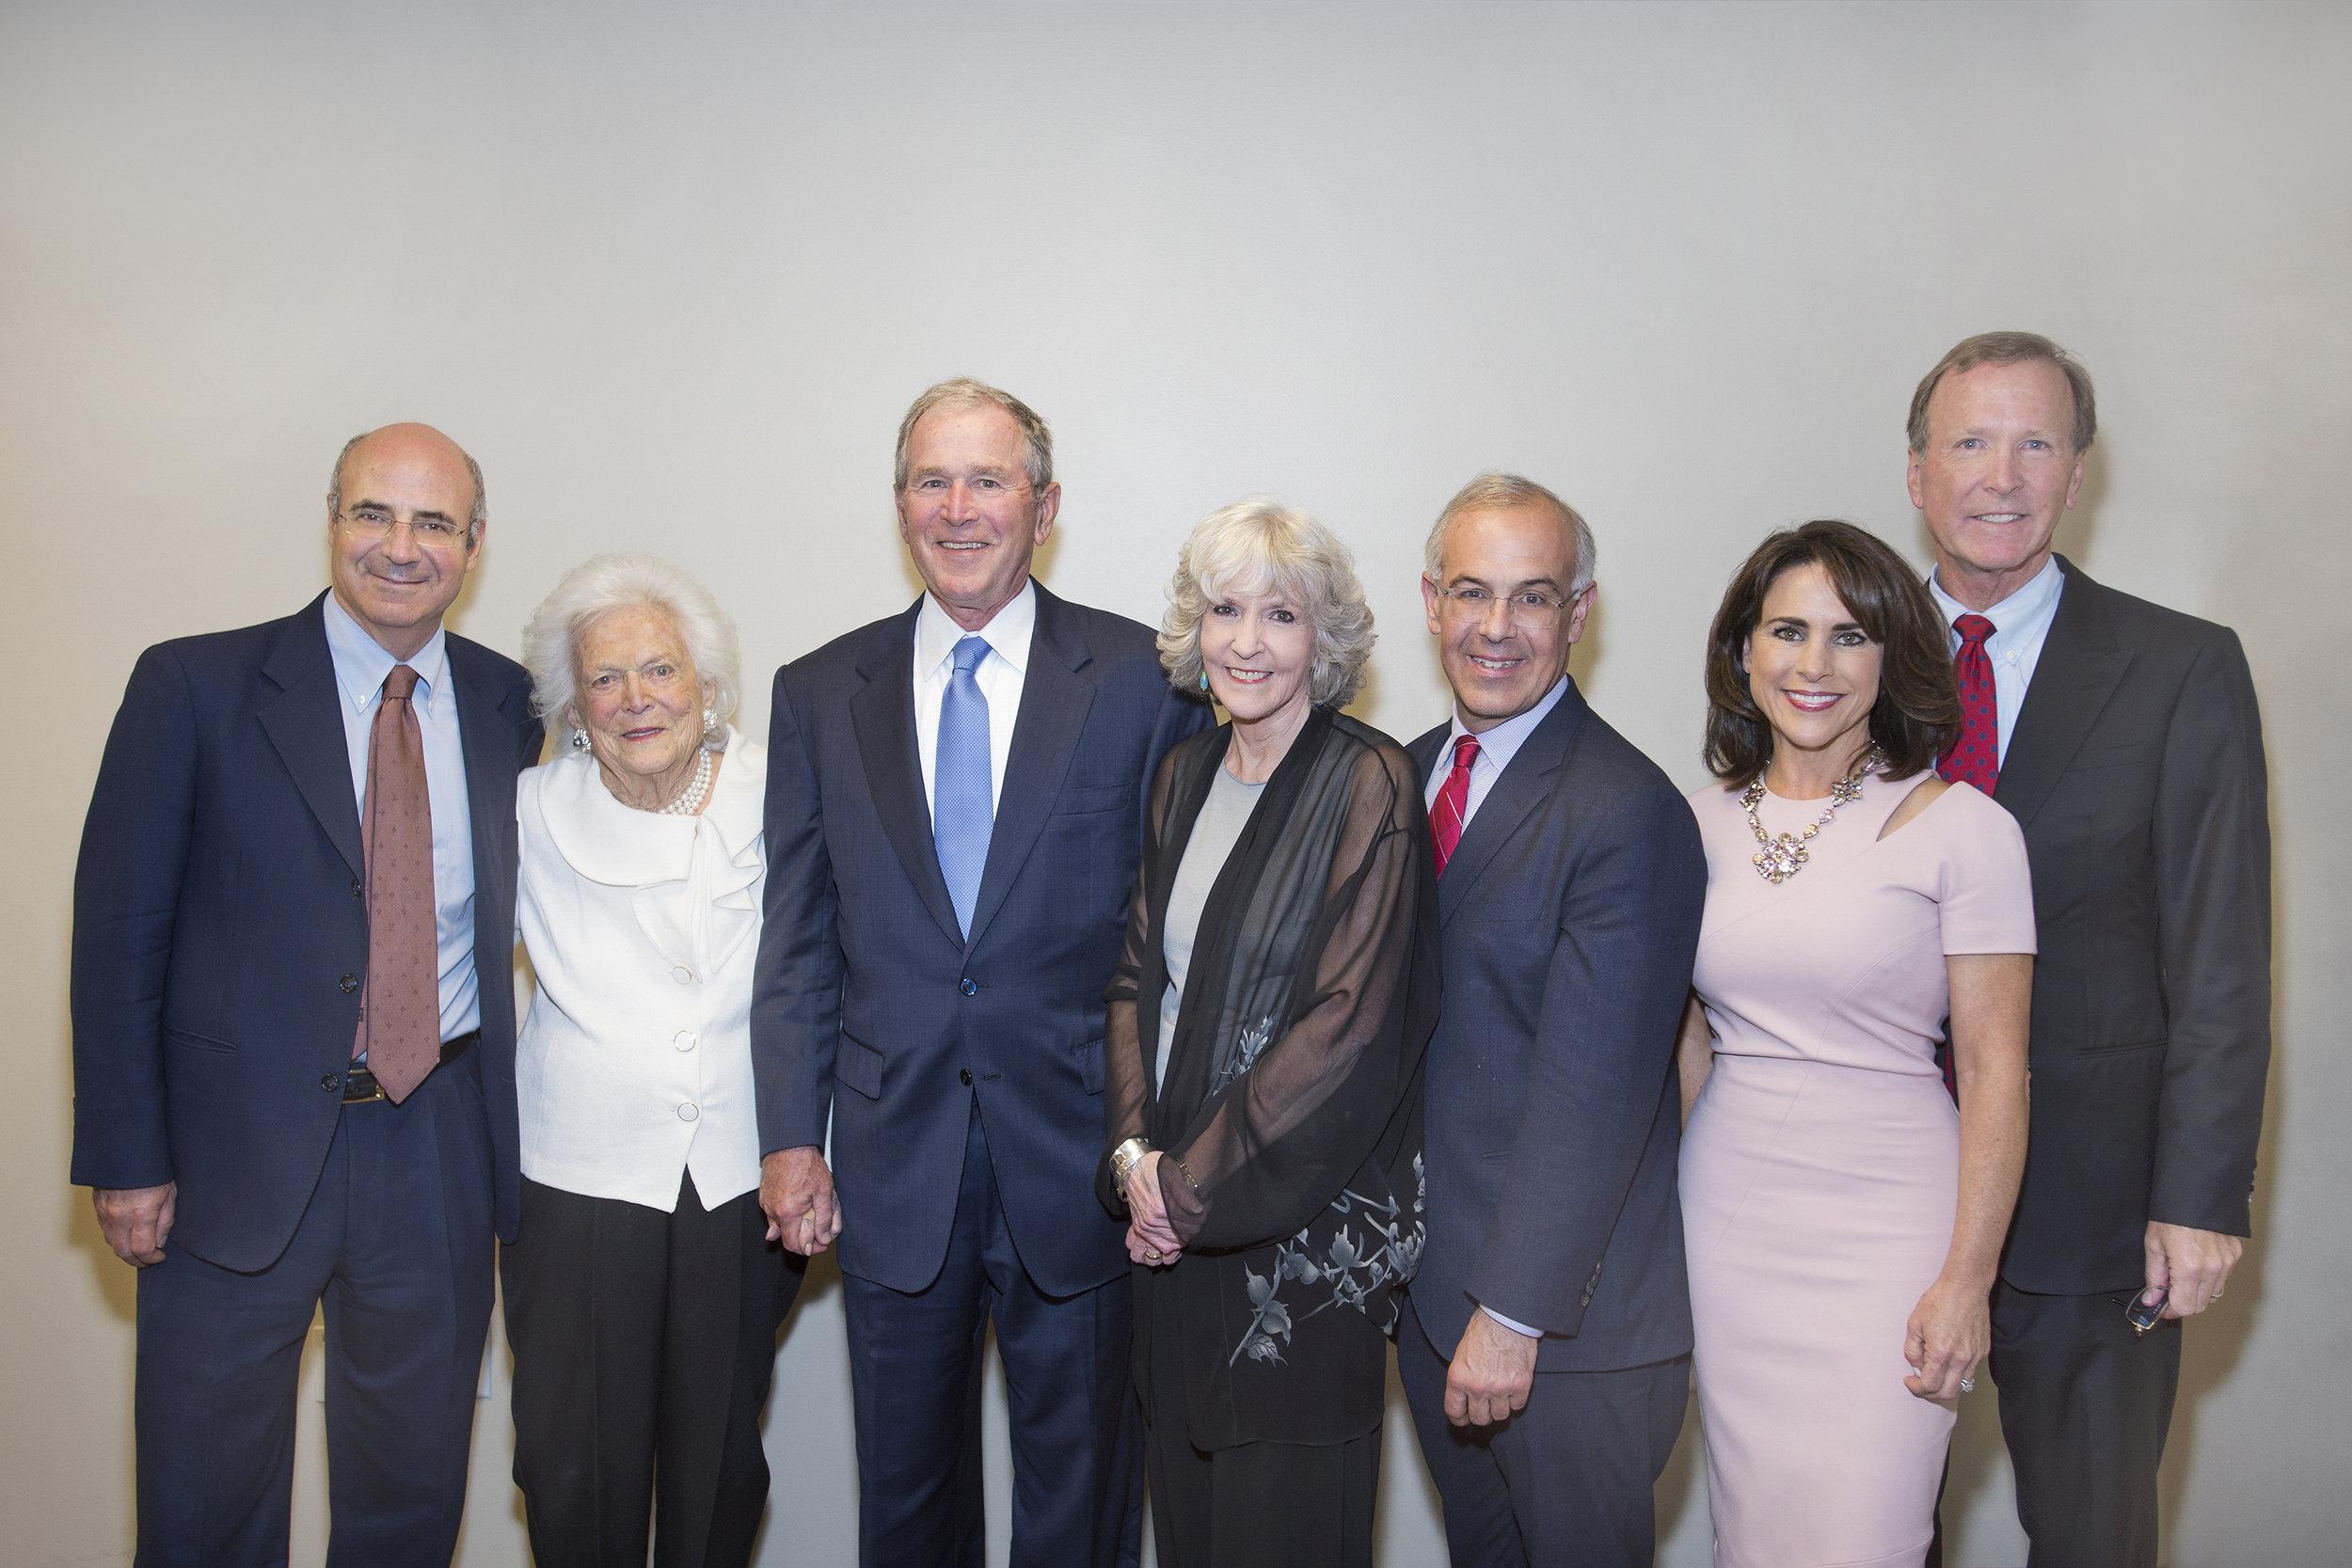 From Left: Bill Browder, Barbara Bush, President George W. Bush, Sue Grafton, David Brooks, Maria and Neil Bush. Photo: David Shutts